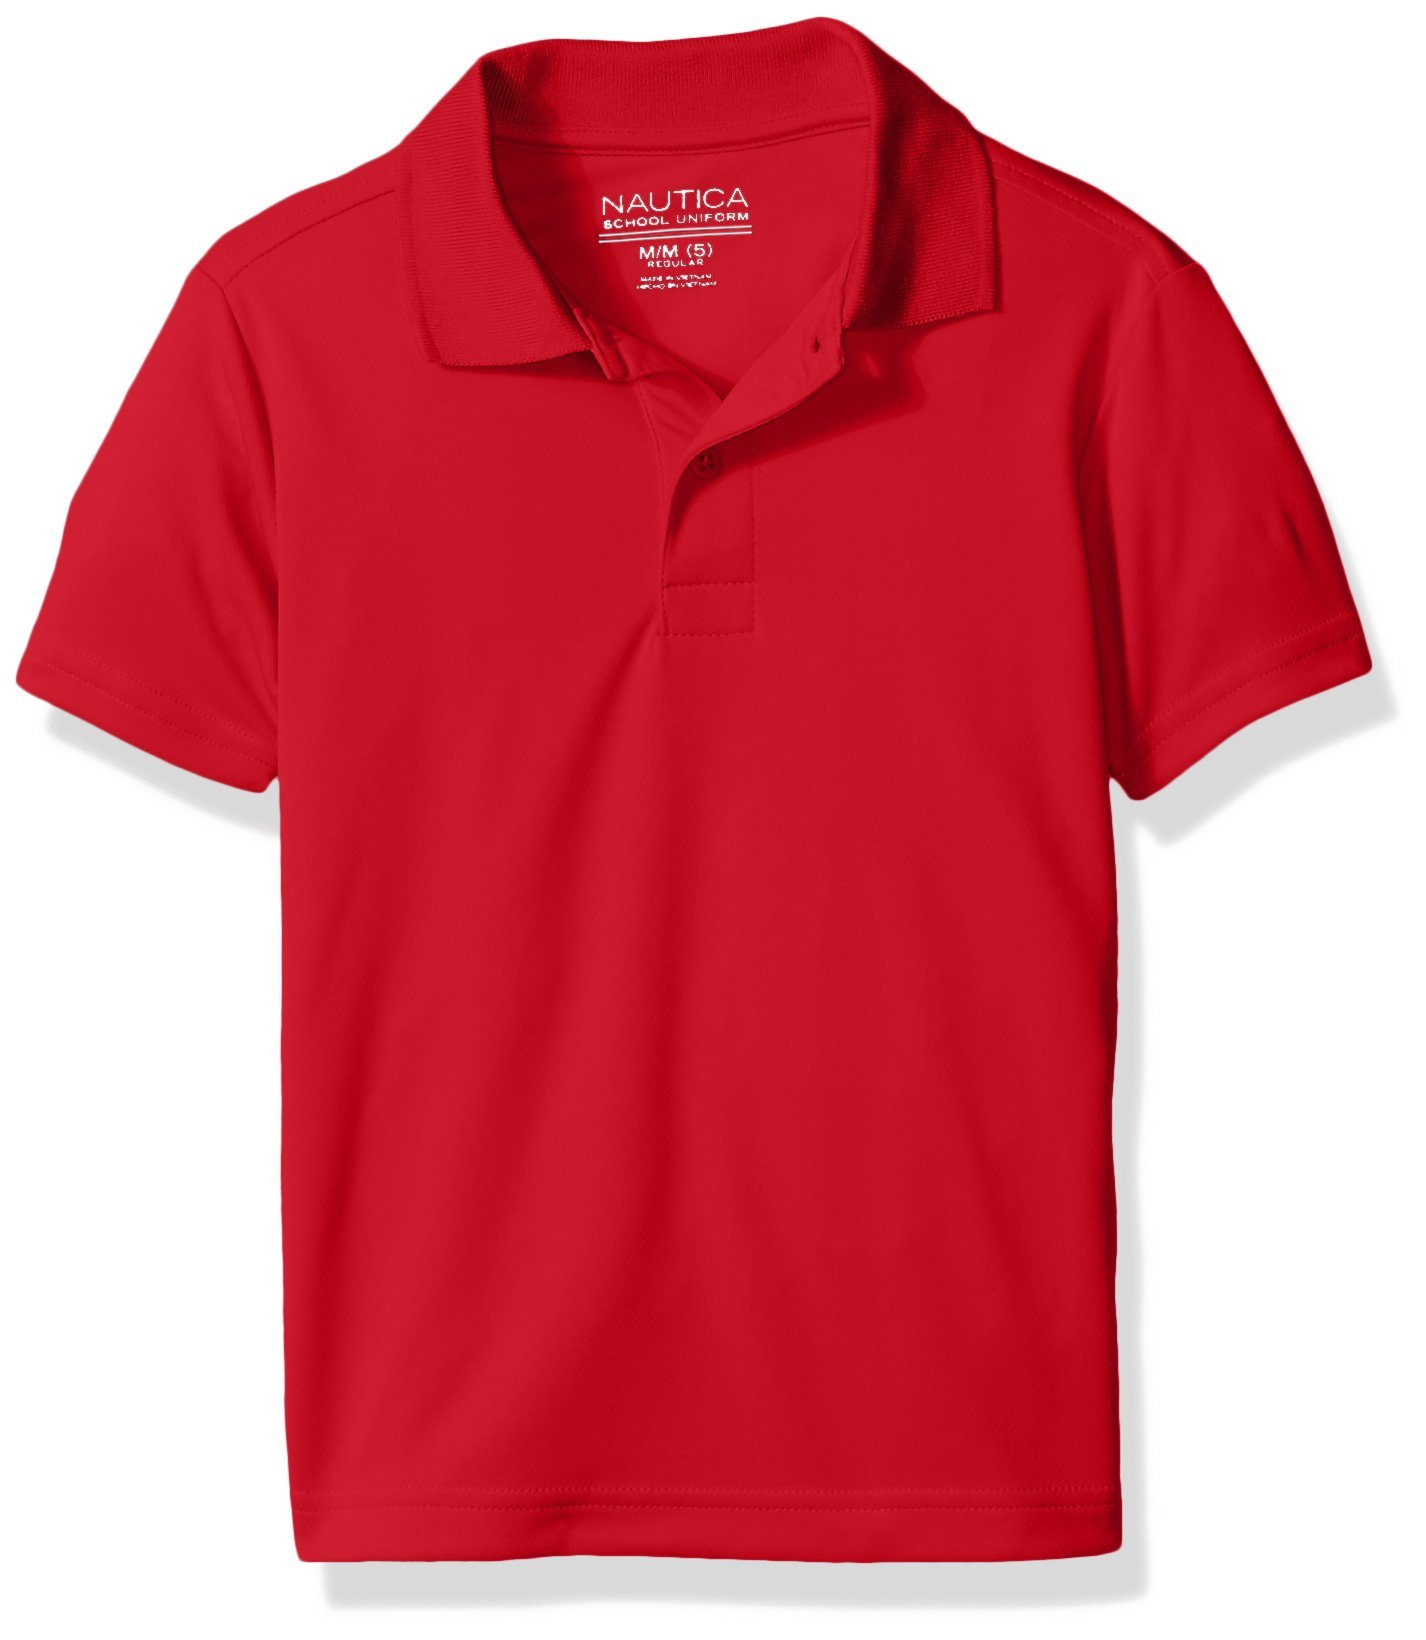 Nautica Boys' Little Boys' Uniform Short Sleeve Performance Polo, Red, Medium/5